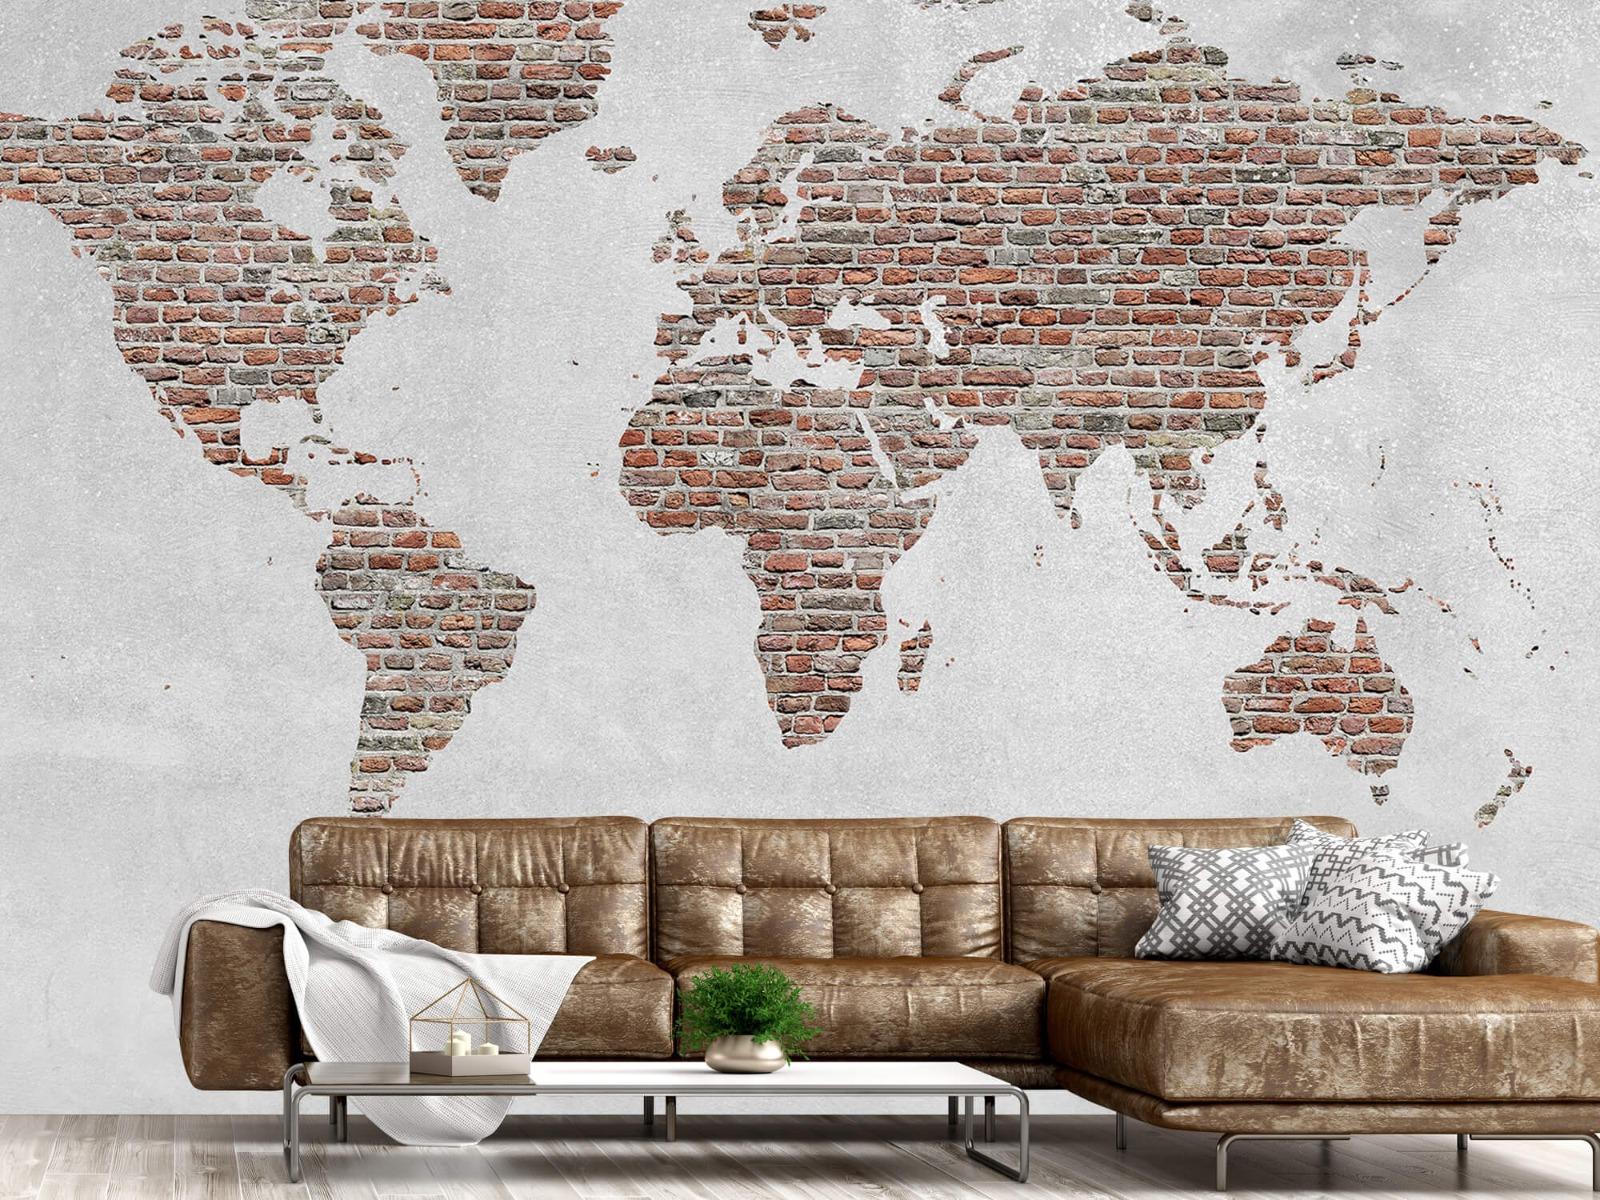 Steen behang - Wereldkaart stenen - Slaapkamer 14